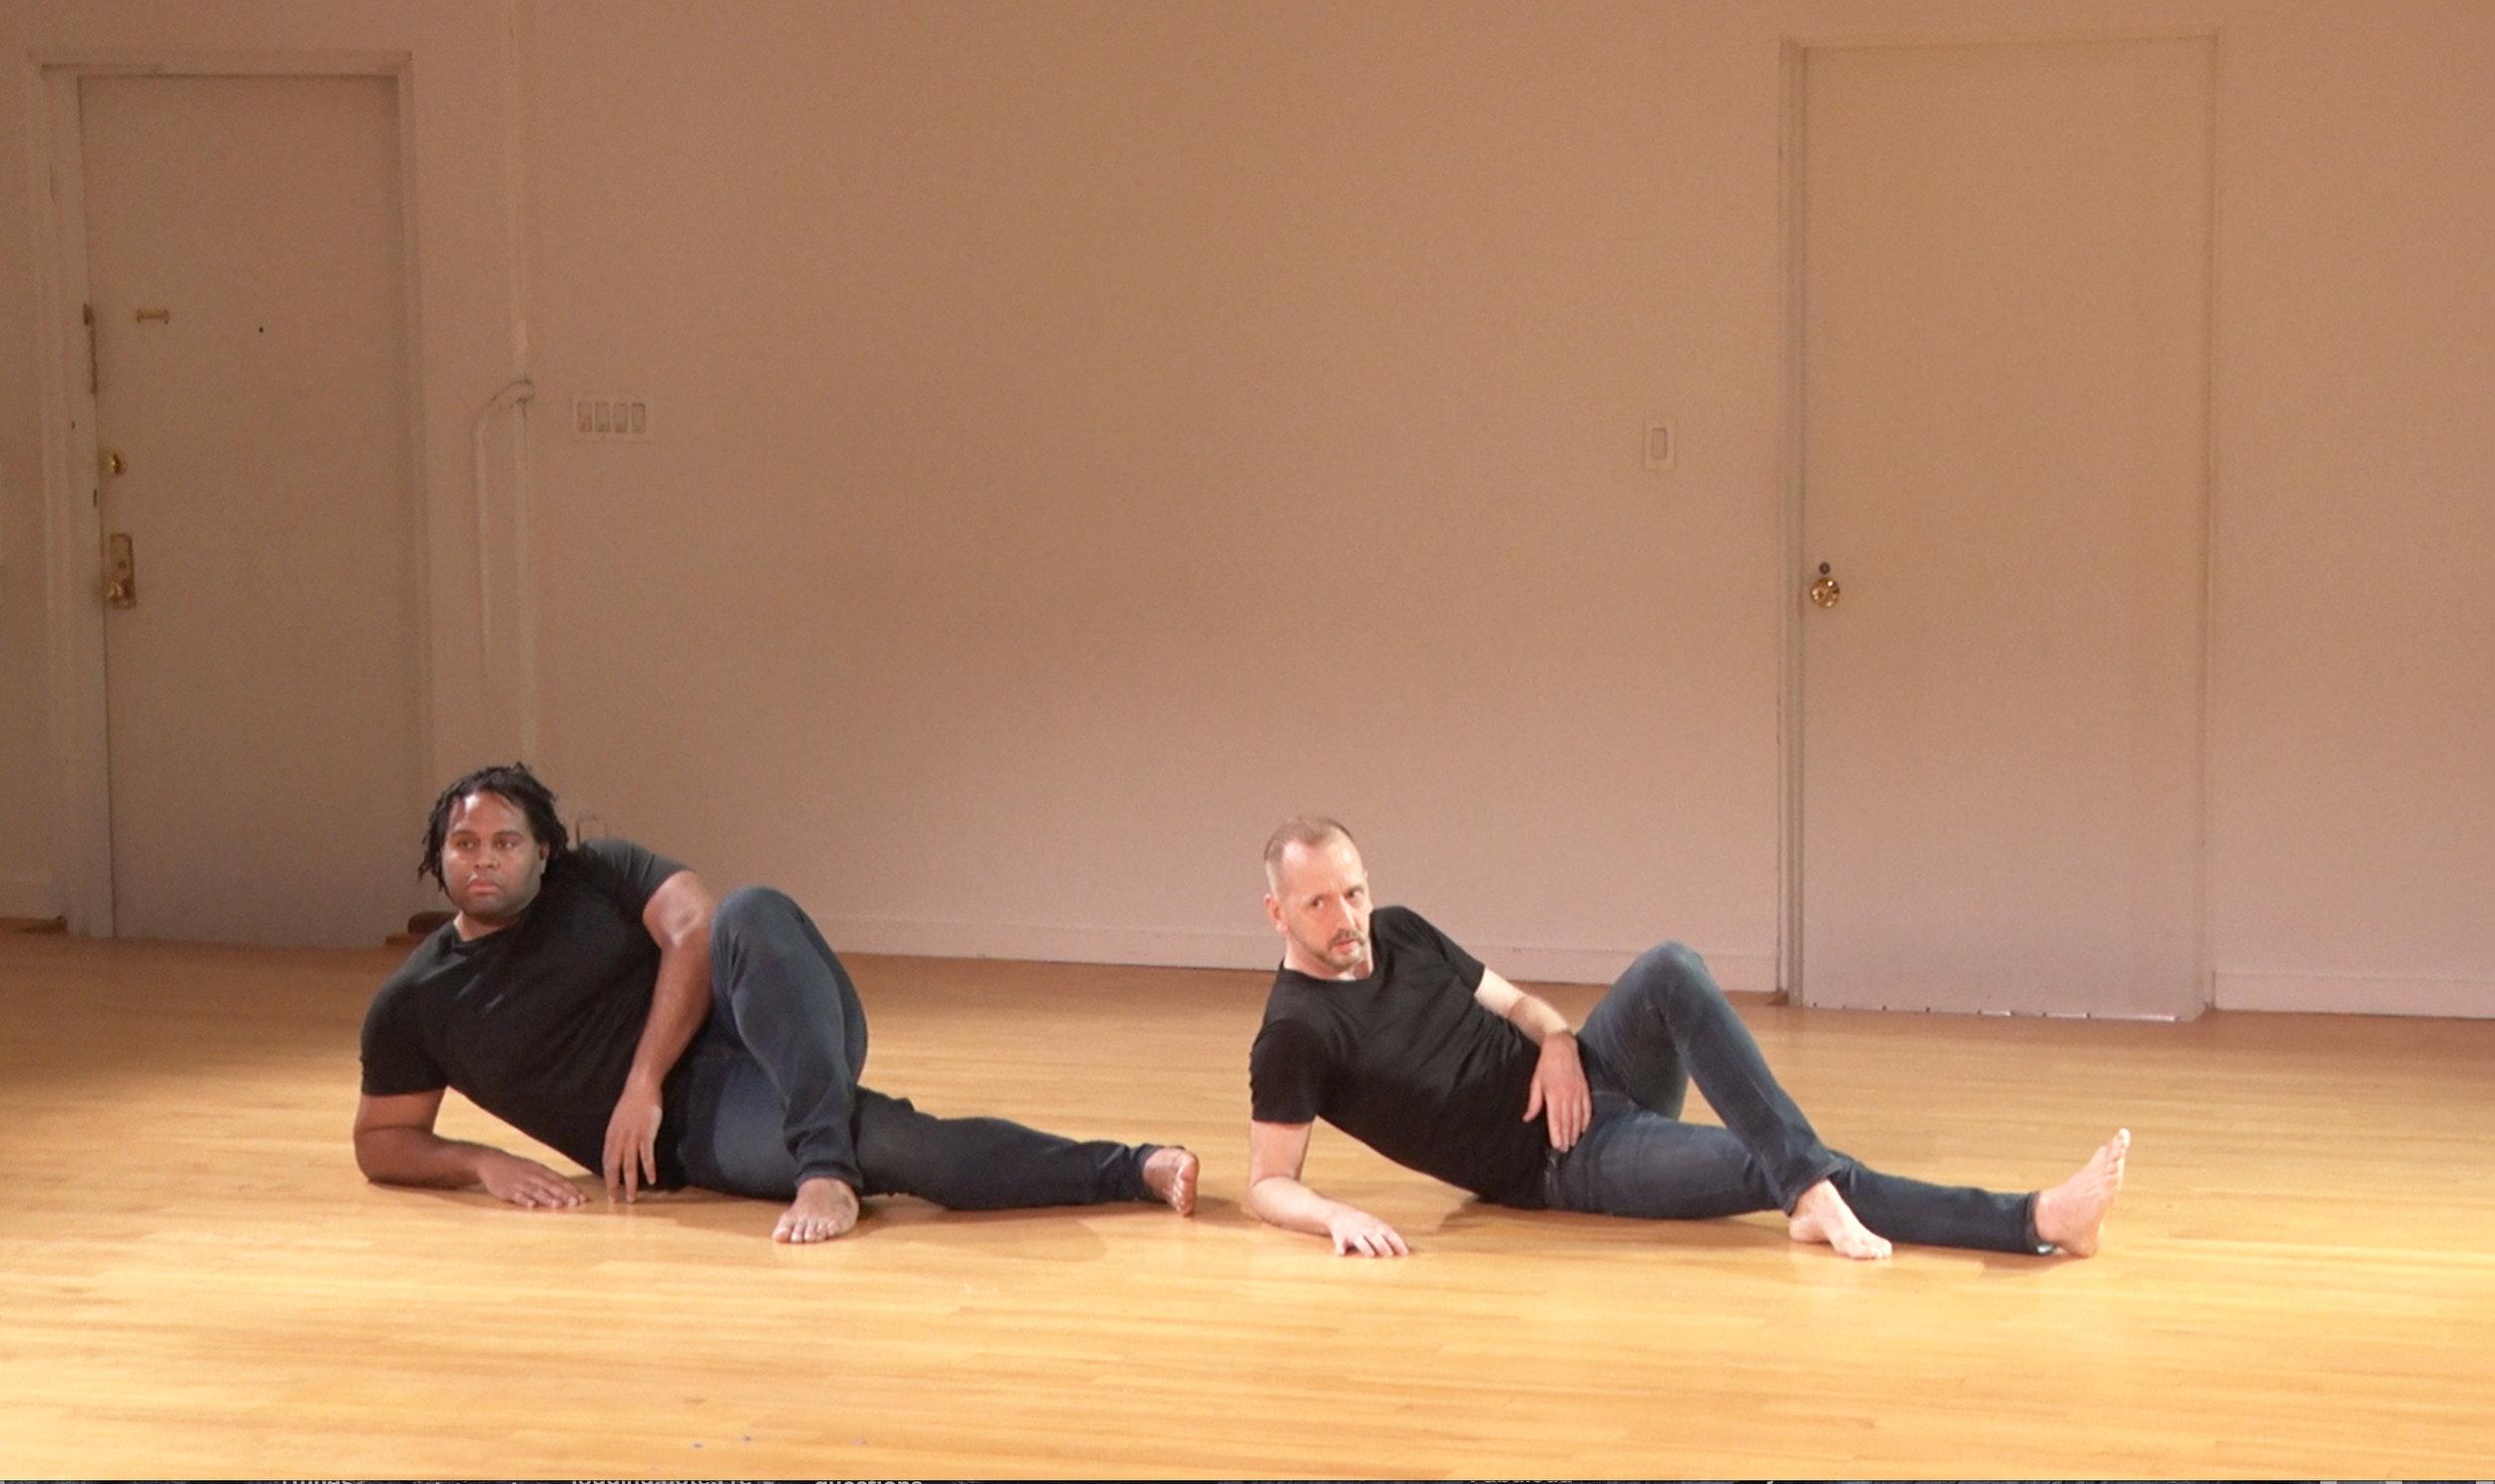 DeAngelo Blanchard and John Jasperse. Photo still from video by Davidson Gliotti.